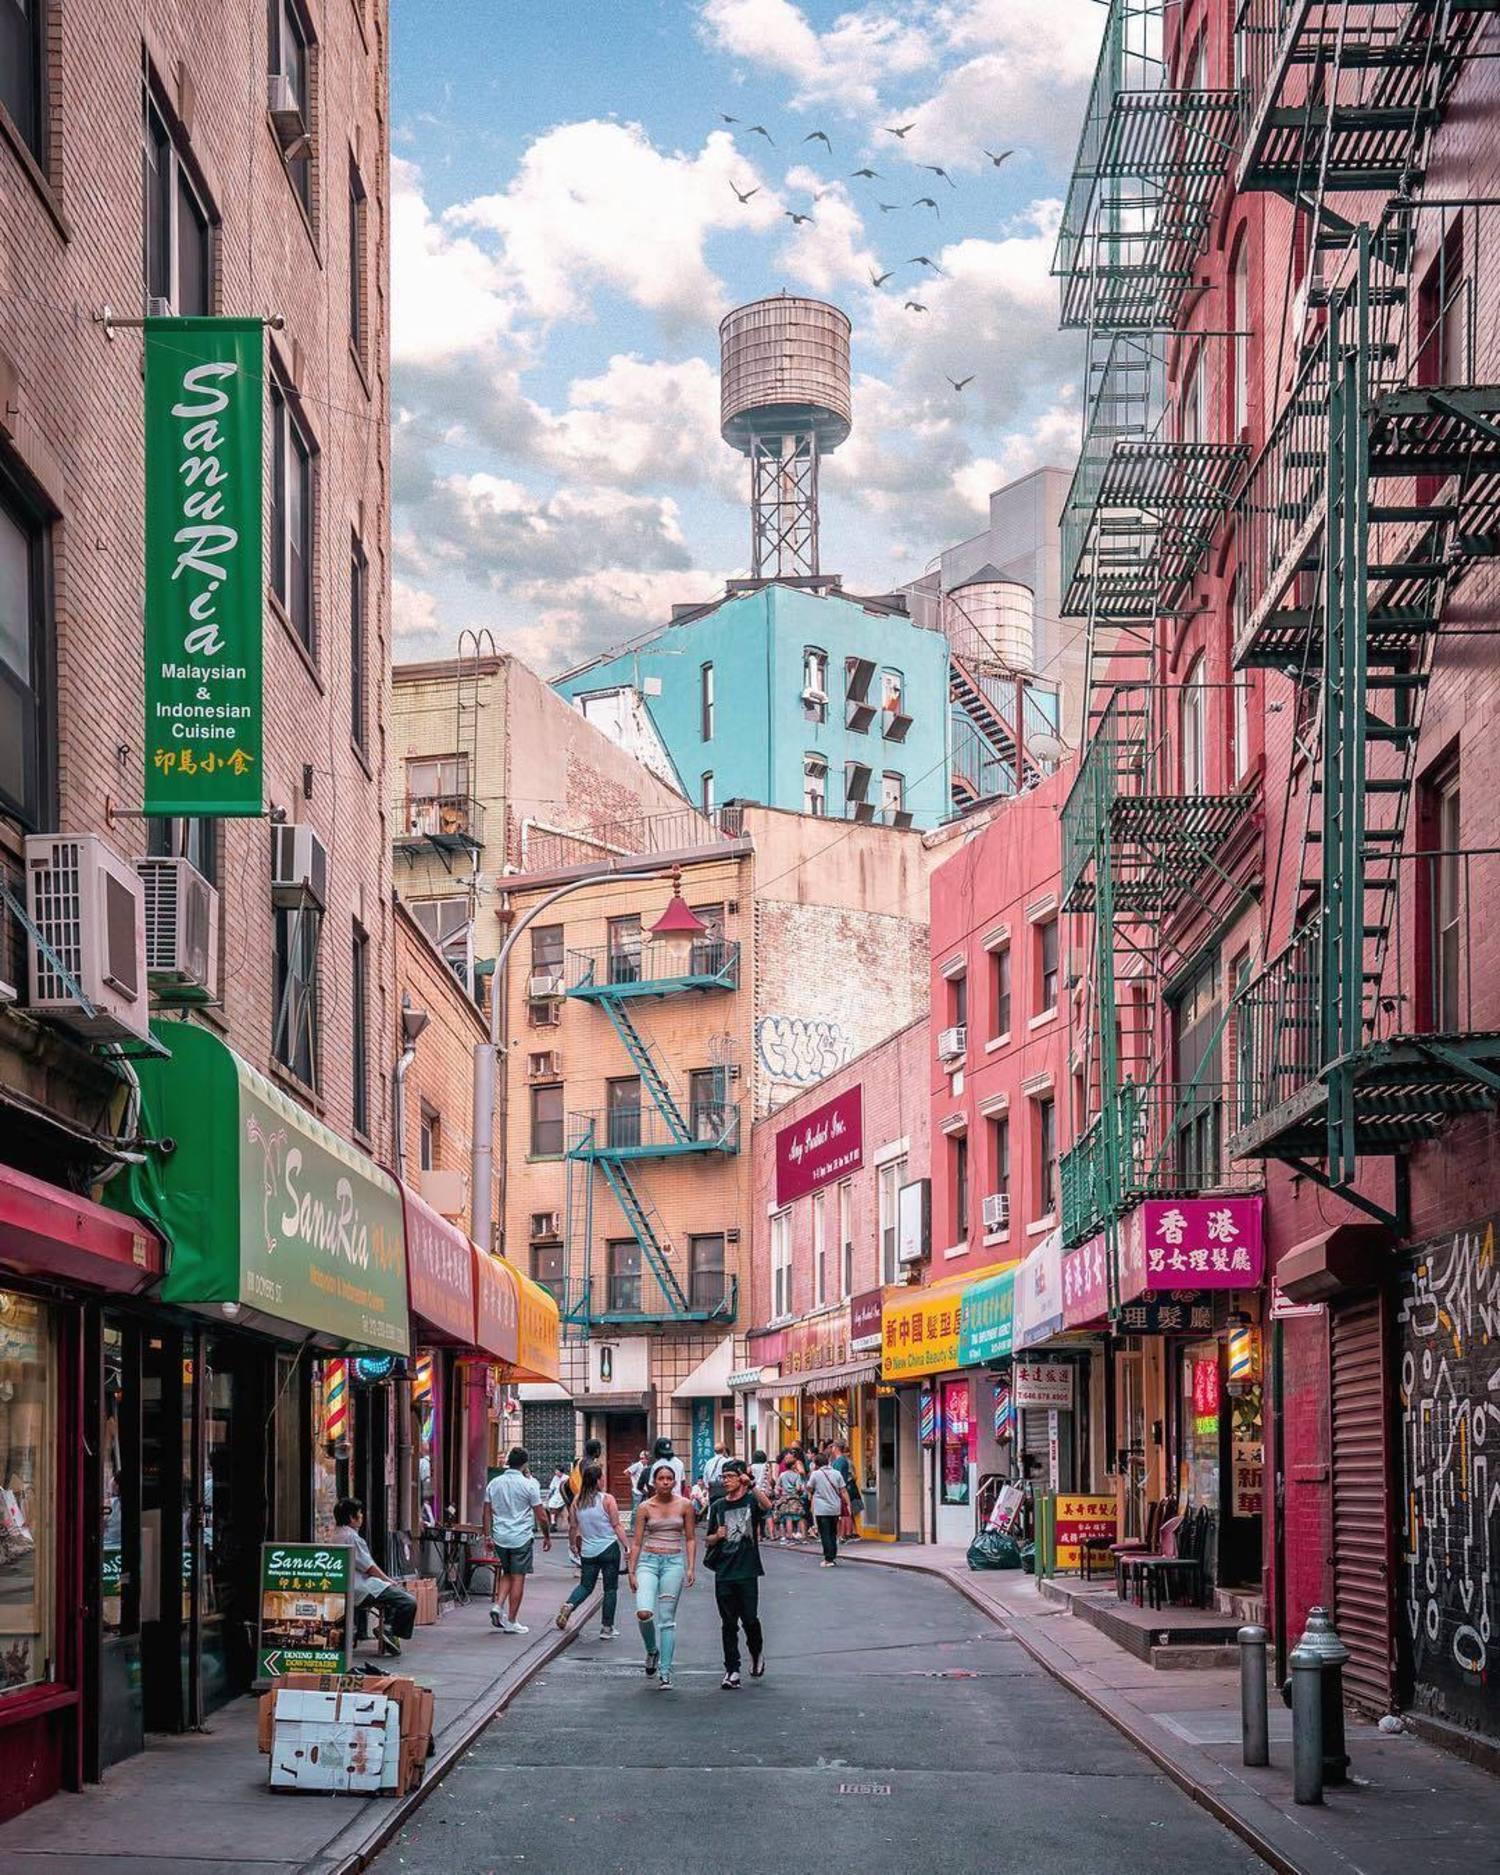 Doyers Street, Chinatown, NYC. Photo via @212sid #viewingnyc #newyork #newyorkcity #nyc